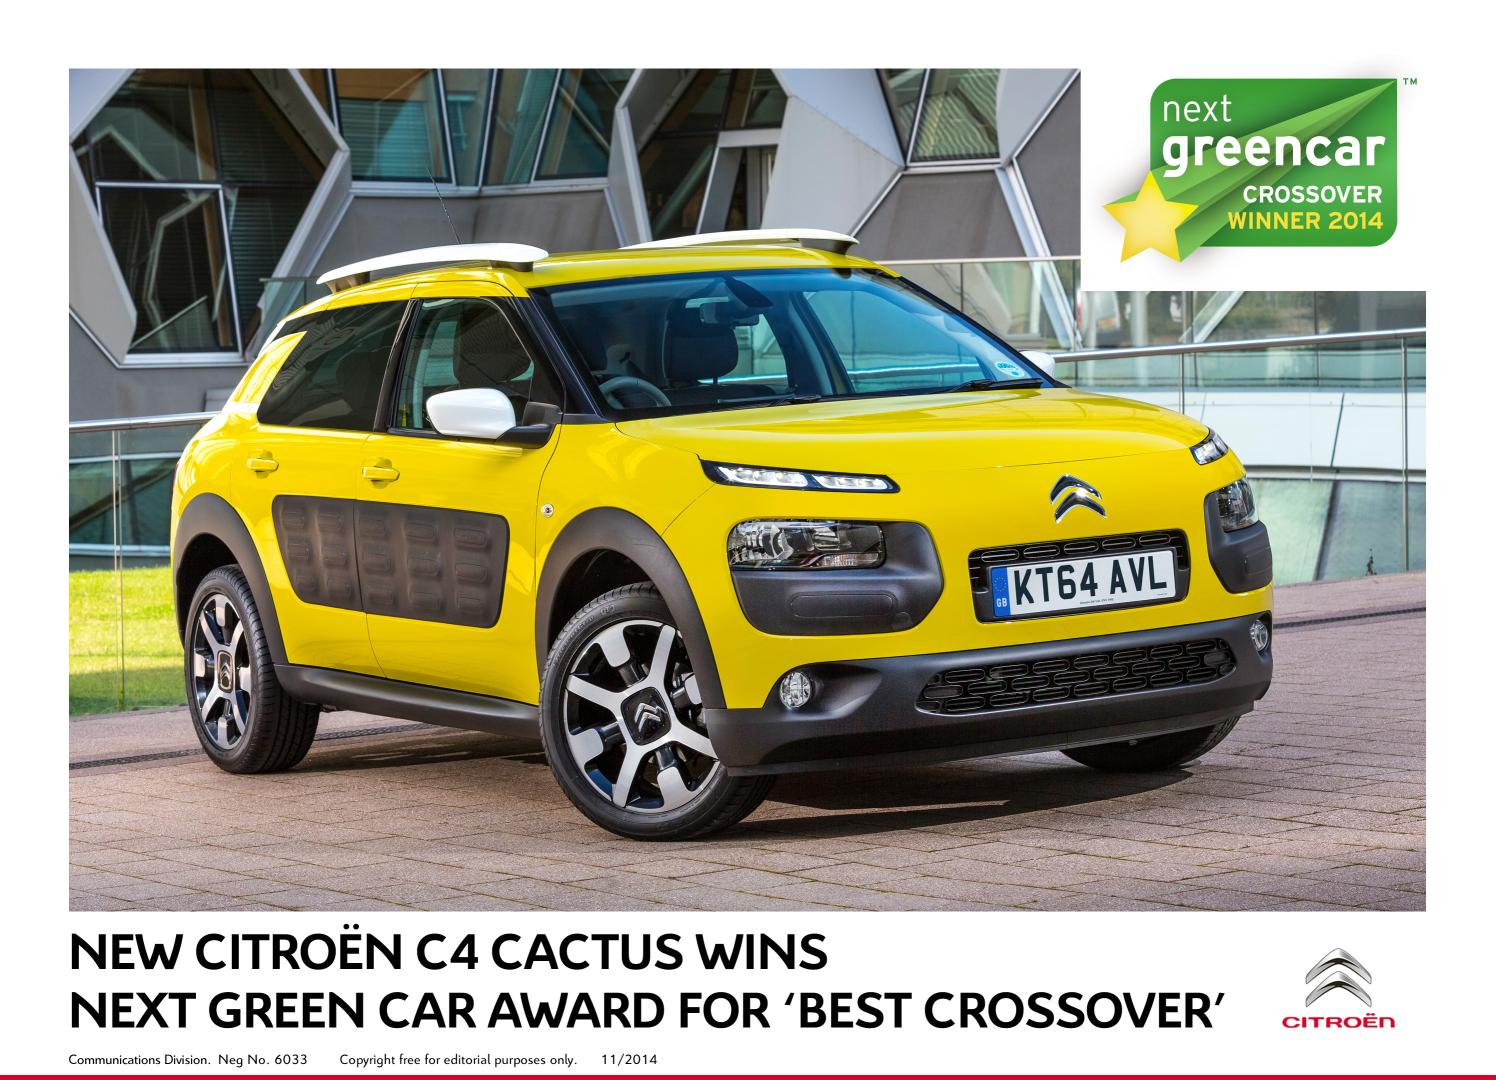 C4 Cactus miglior Crossover ai Next Green Car Awards